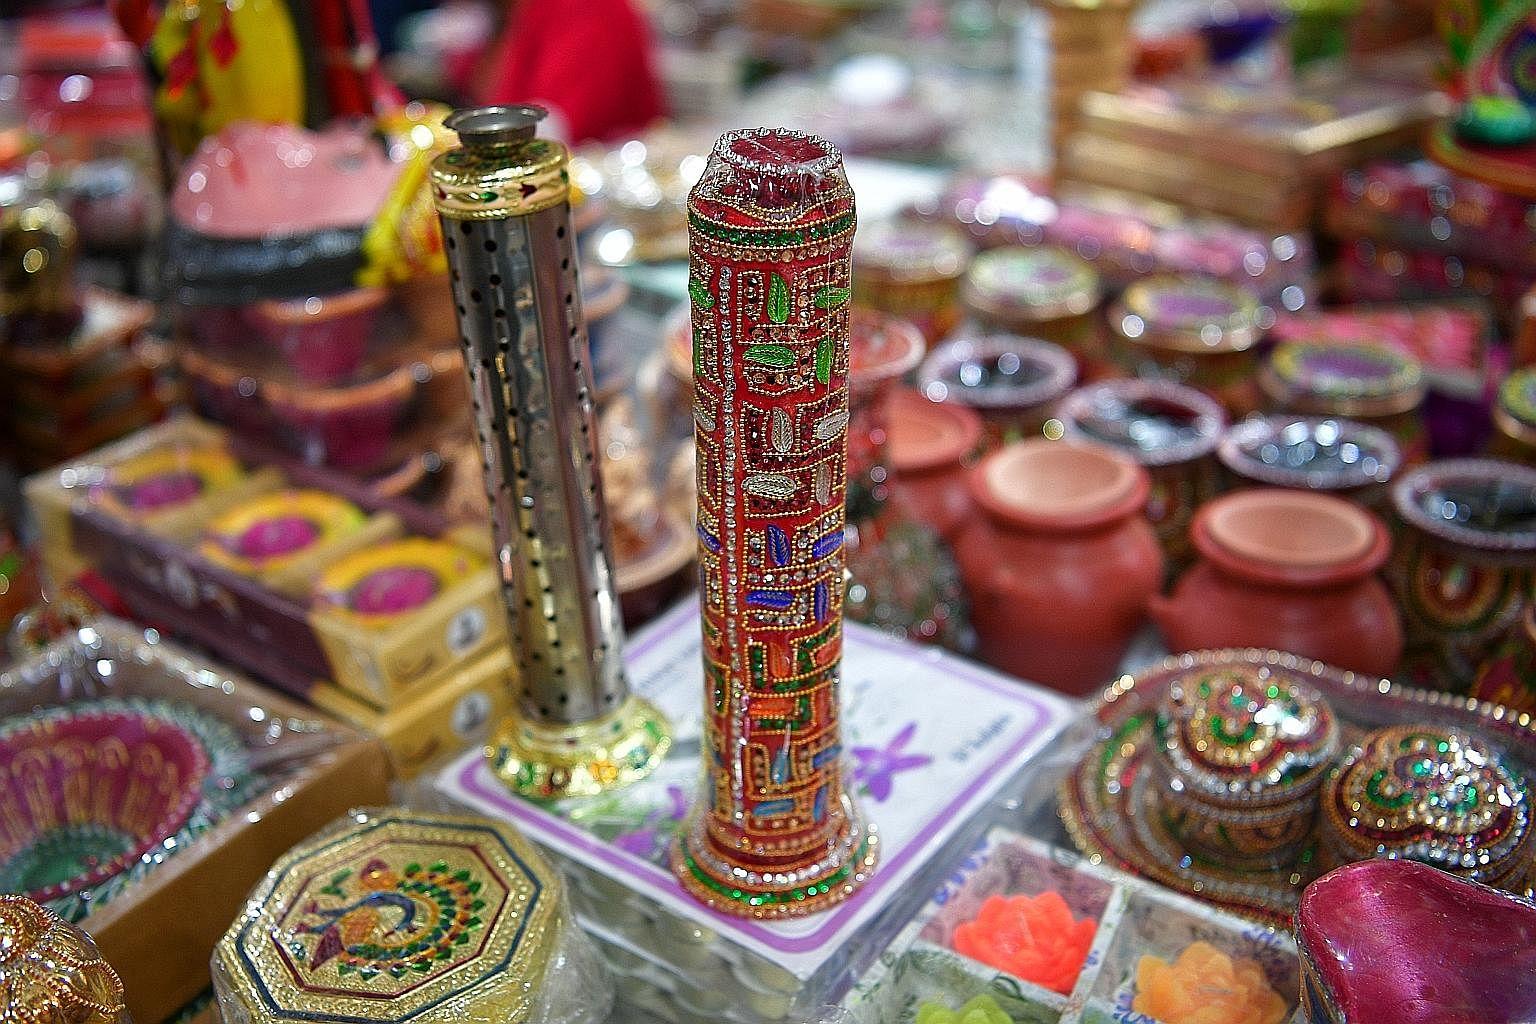 The Deepavali Festival Village is an iconic annual Deepavali event.